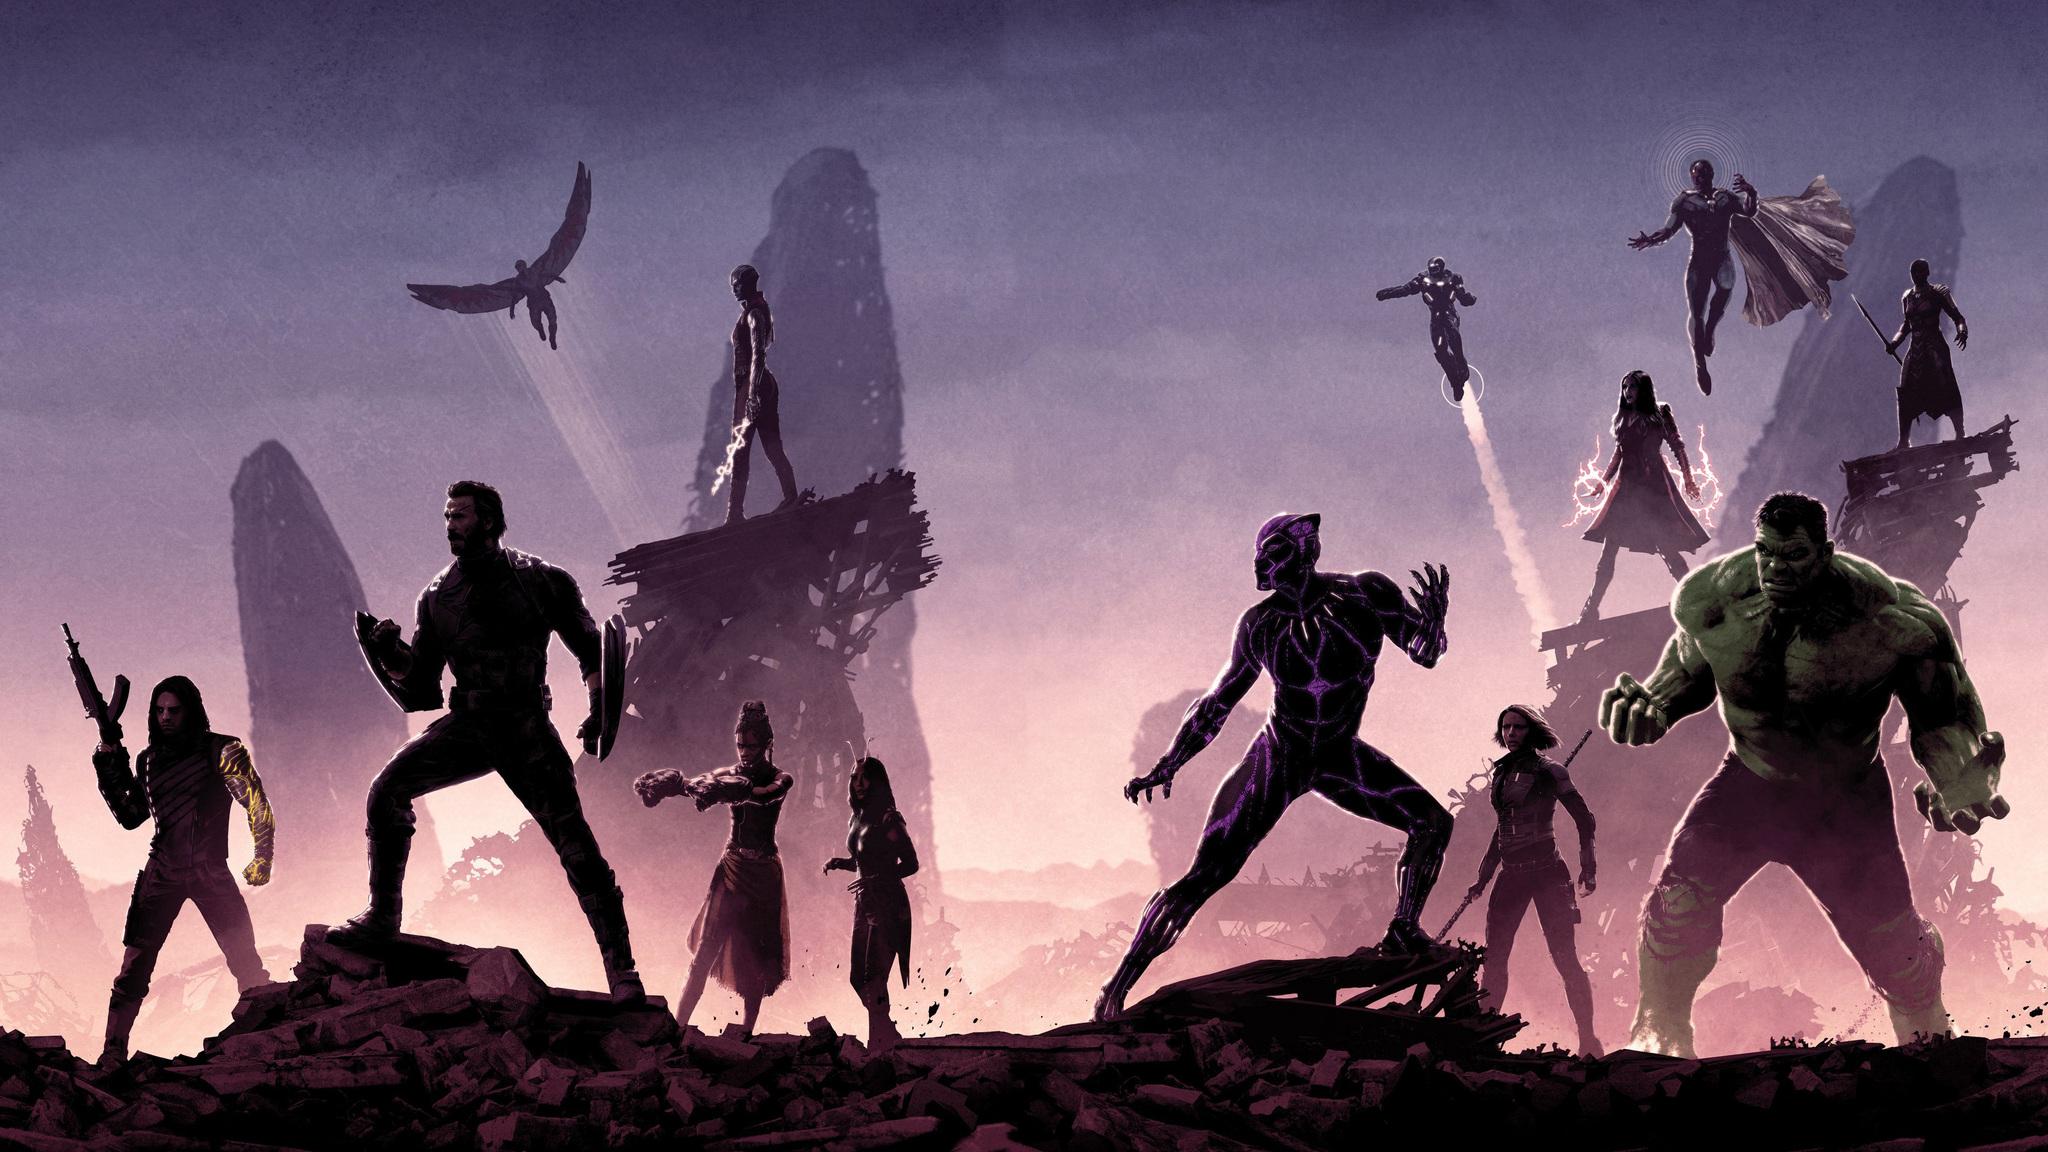 2048x1152 Avengers Infinity War Promotion Poster 4k